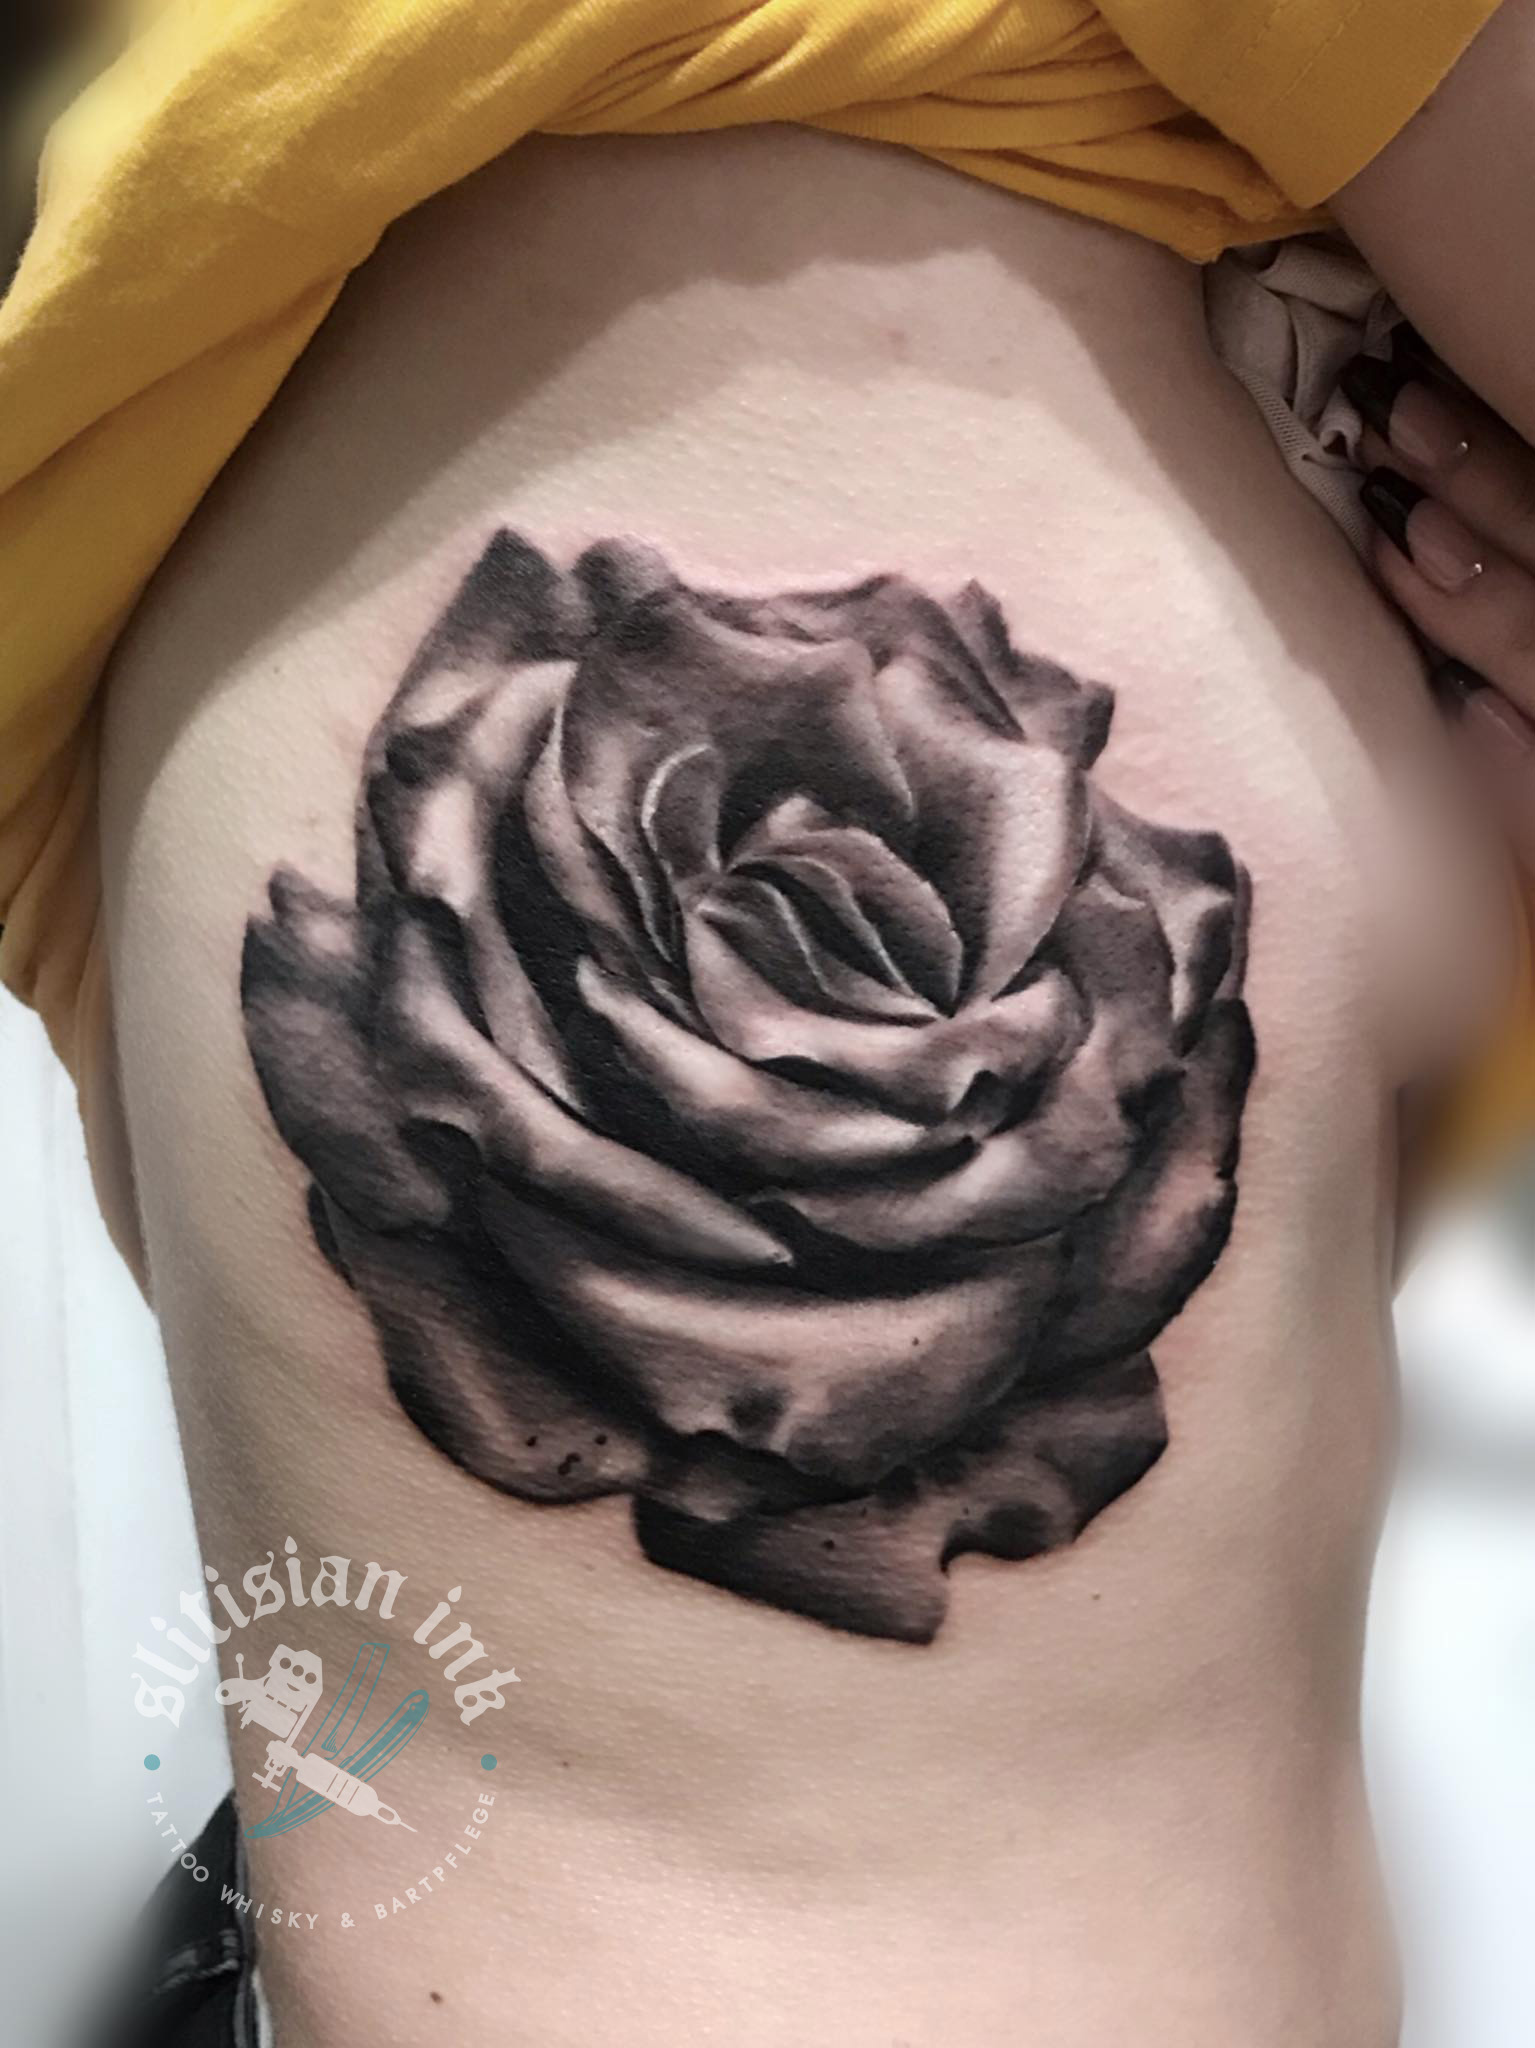 roseserghei